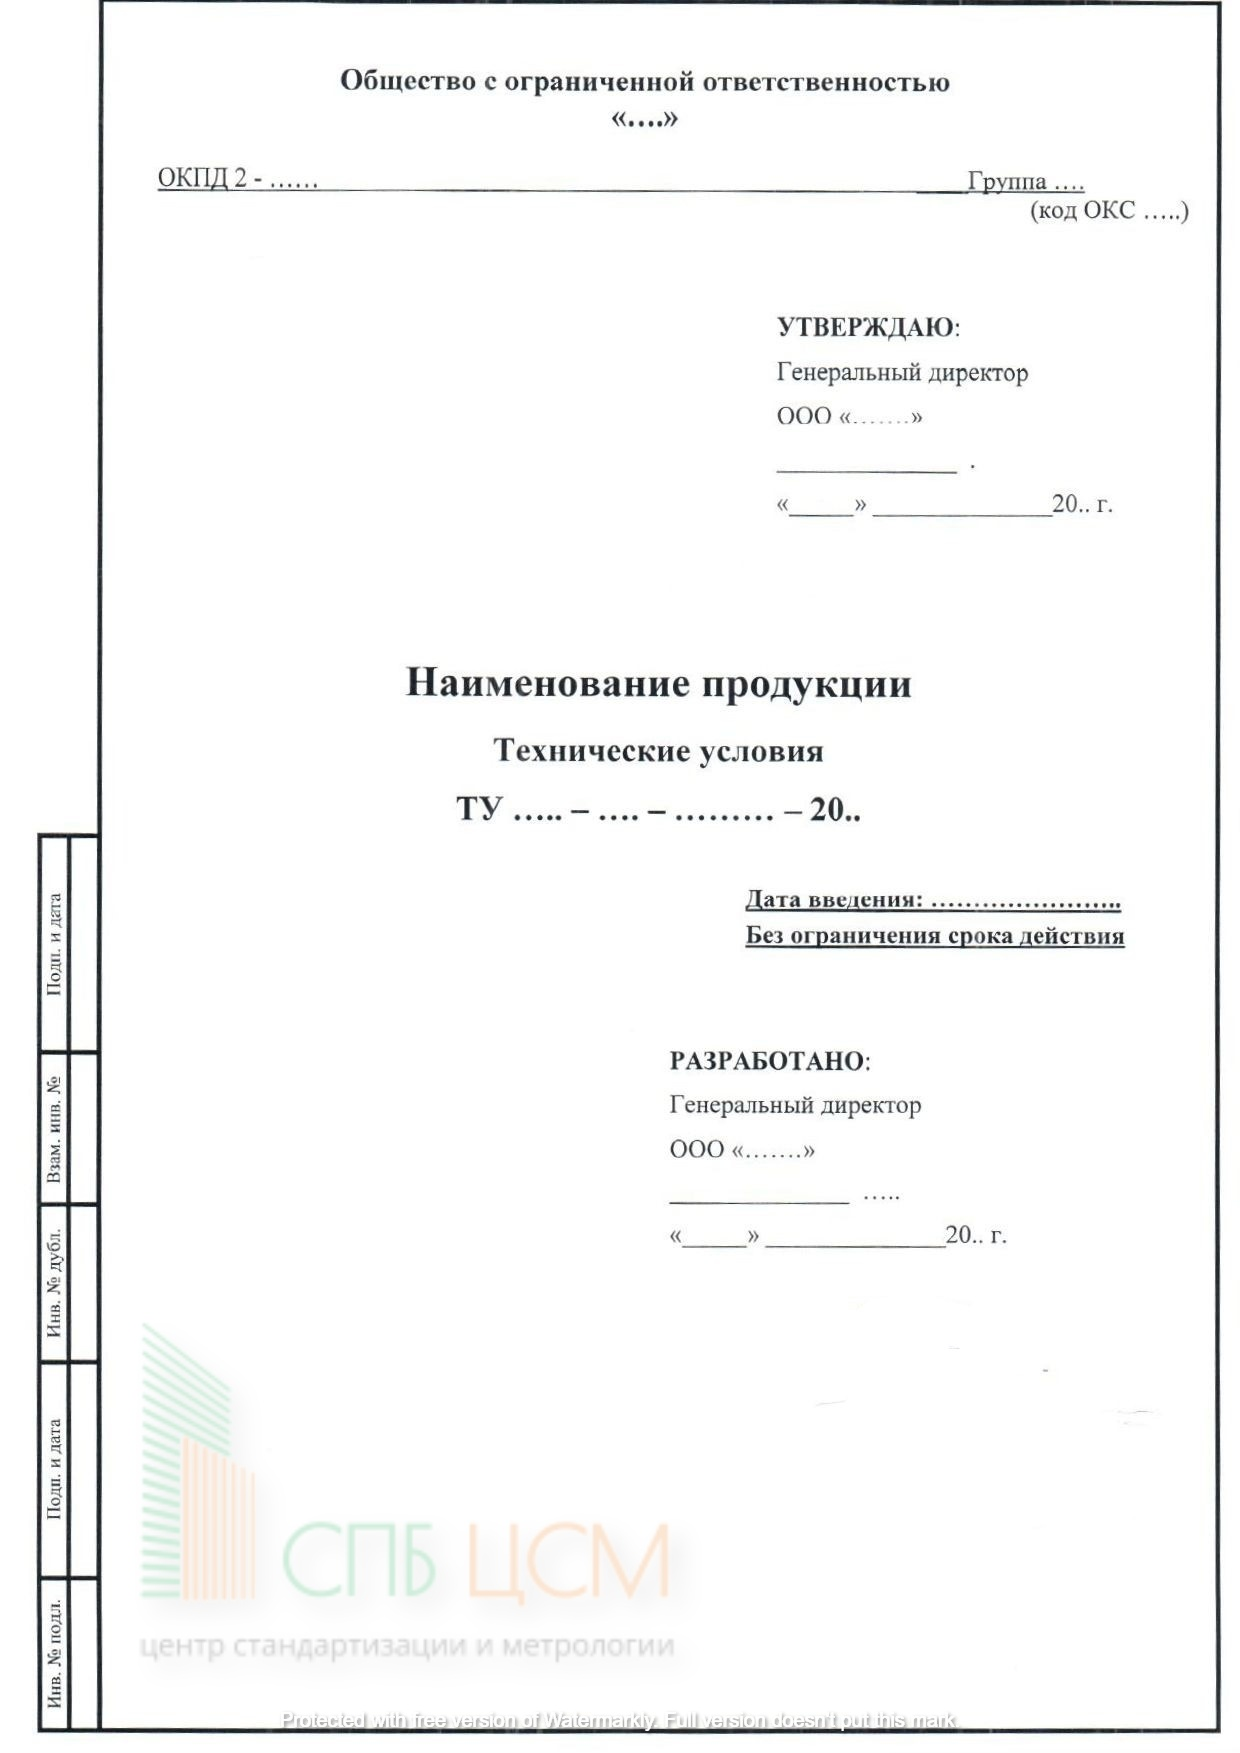 https://spbcsm.ru/razrabotka-texnicheskoj-dokumentacii/razrabotka-i-registracija-tu/#content